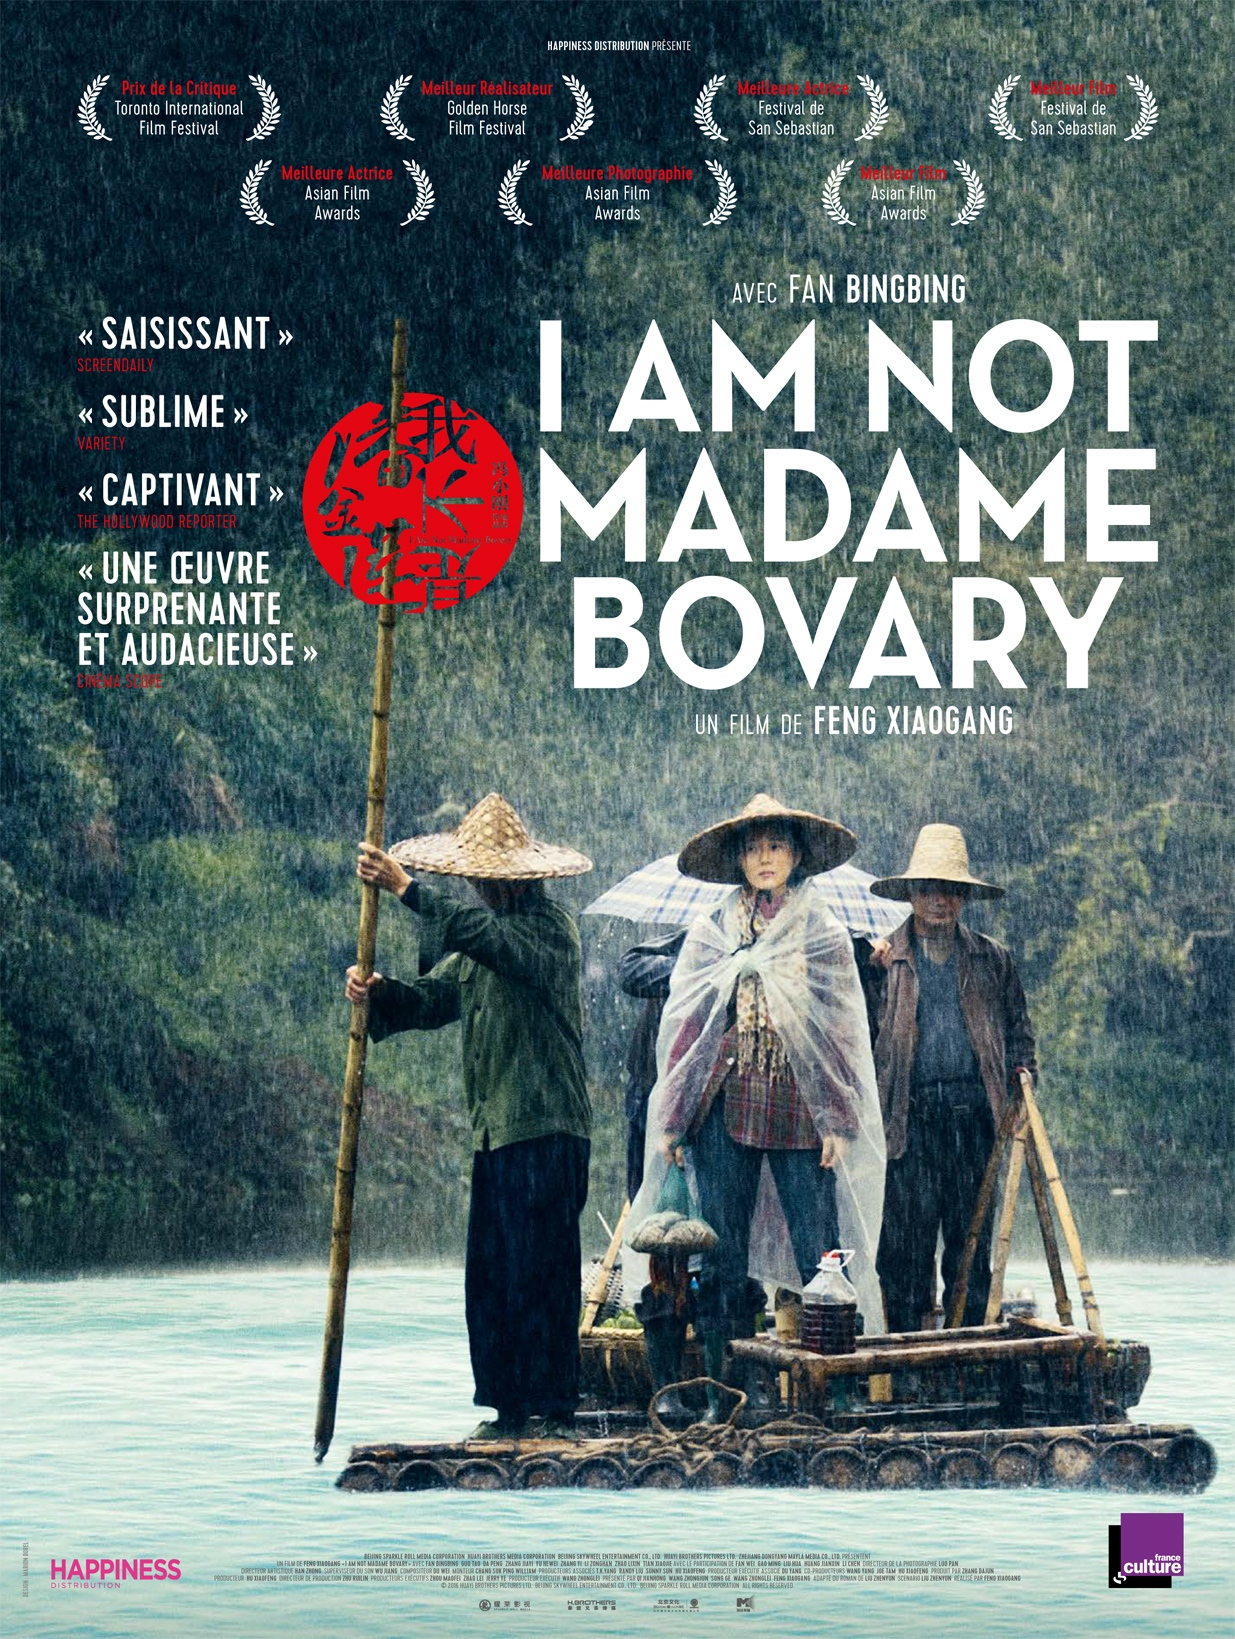 [Concours] I am not Madame Bovary : 5 places pour deux personnes à gagner !